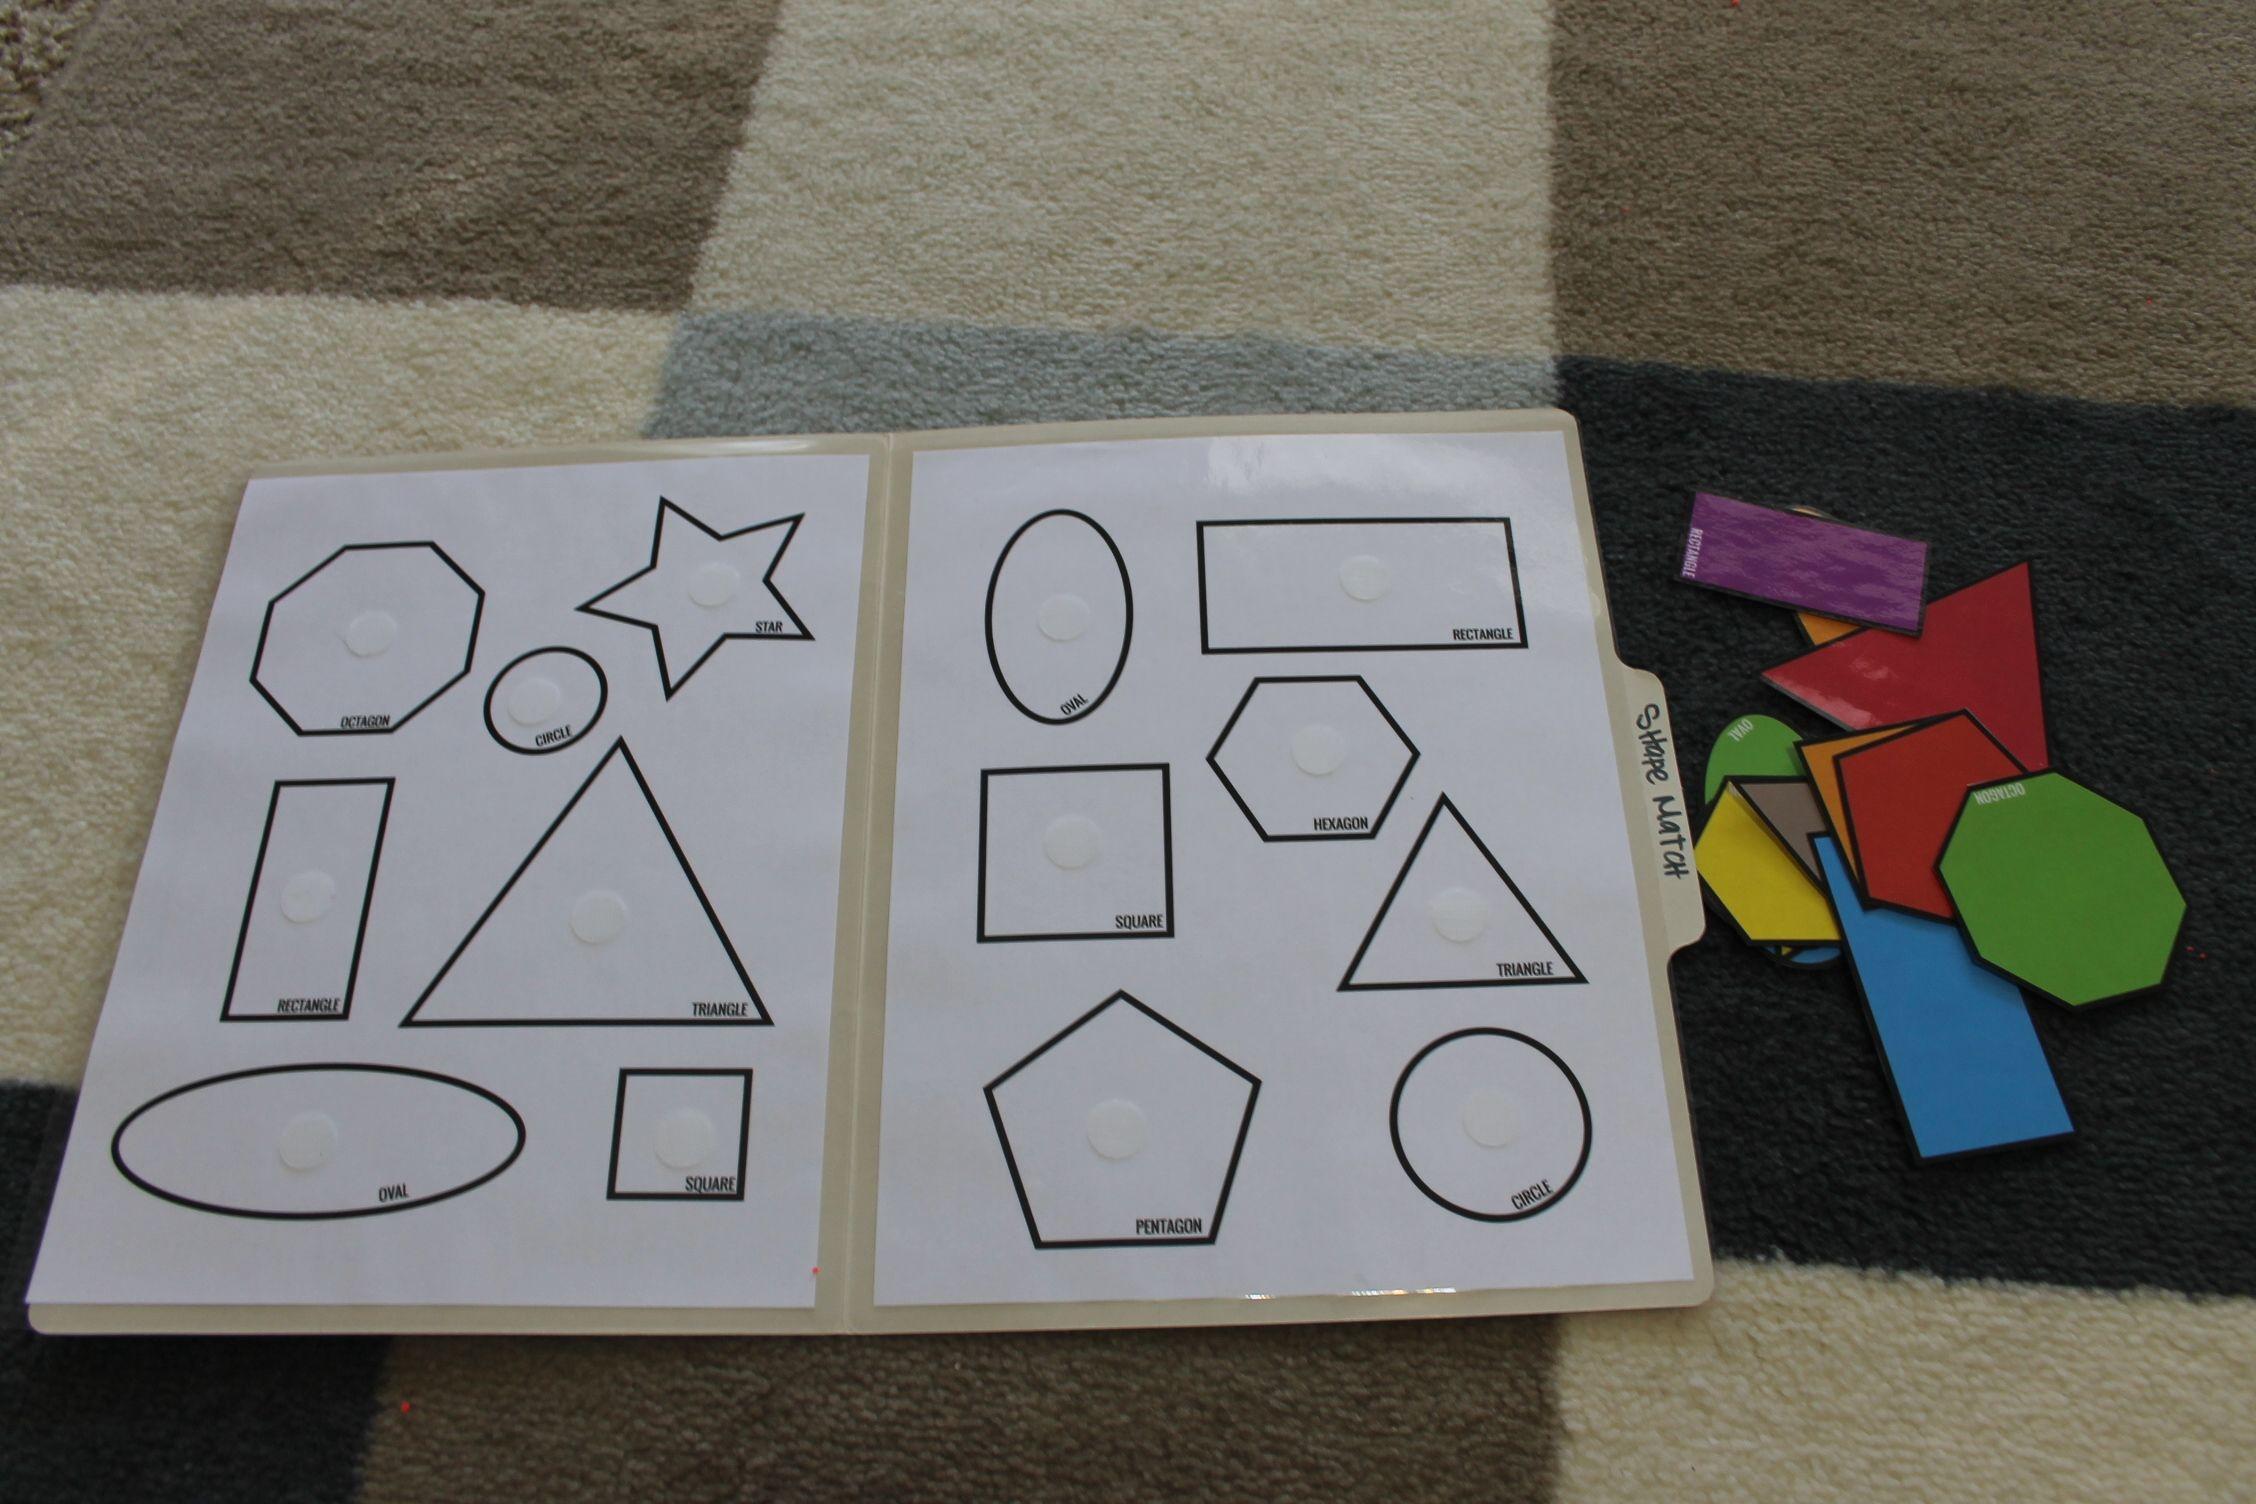 Shape-Match-Toddler-Pre-K-File-Folder-Game-Open | Kiddios - Free Printable File Folder Games For Preschool